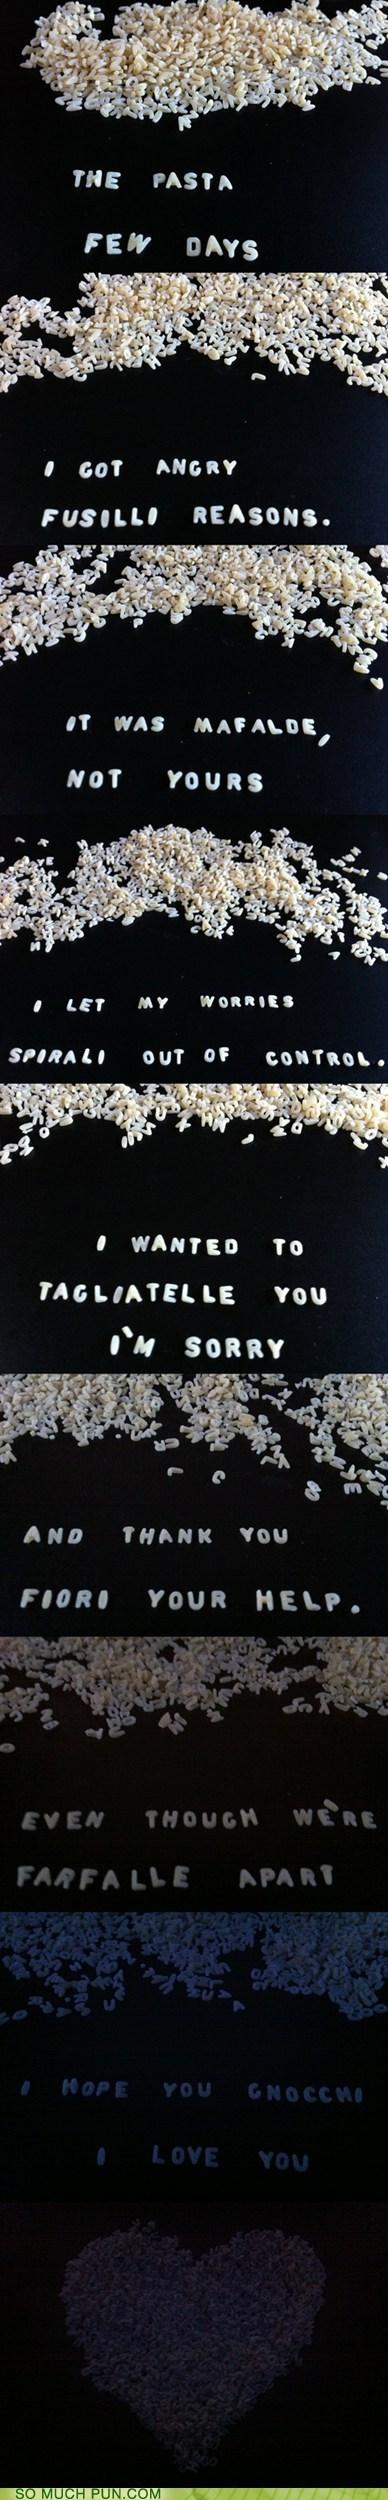 apologizing,apology,pasta,similar sounding,types,variety